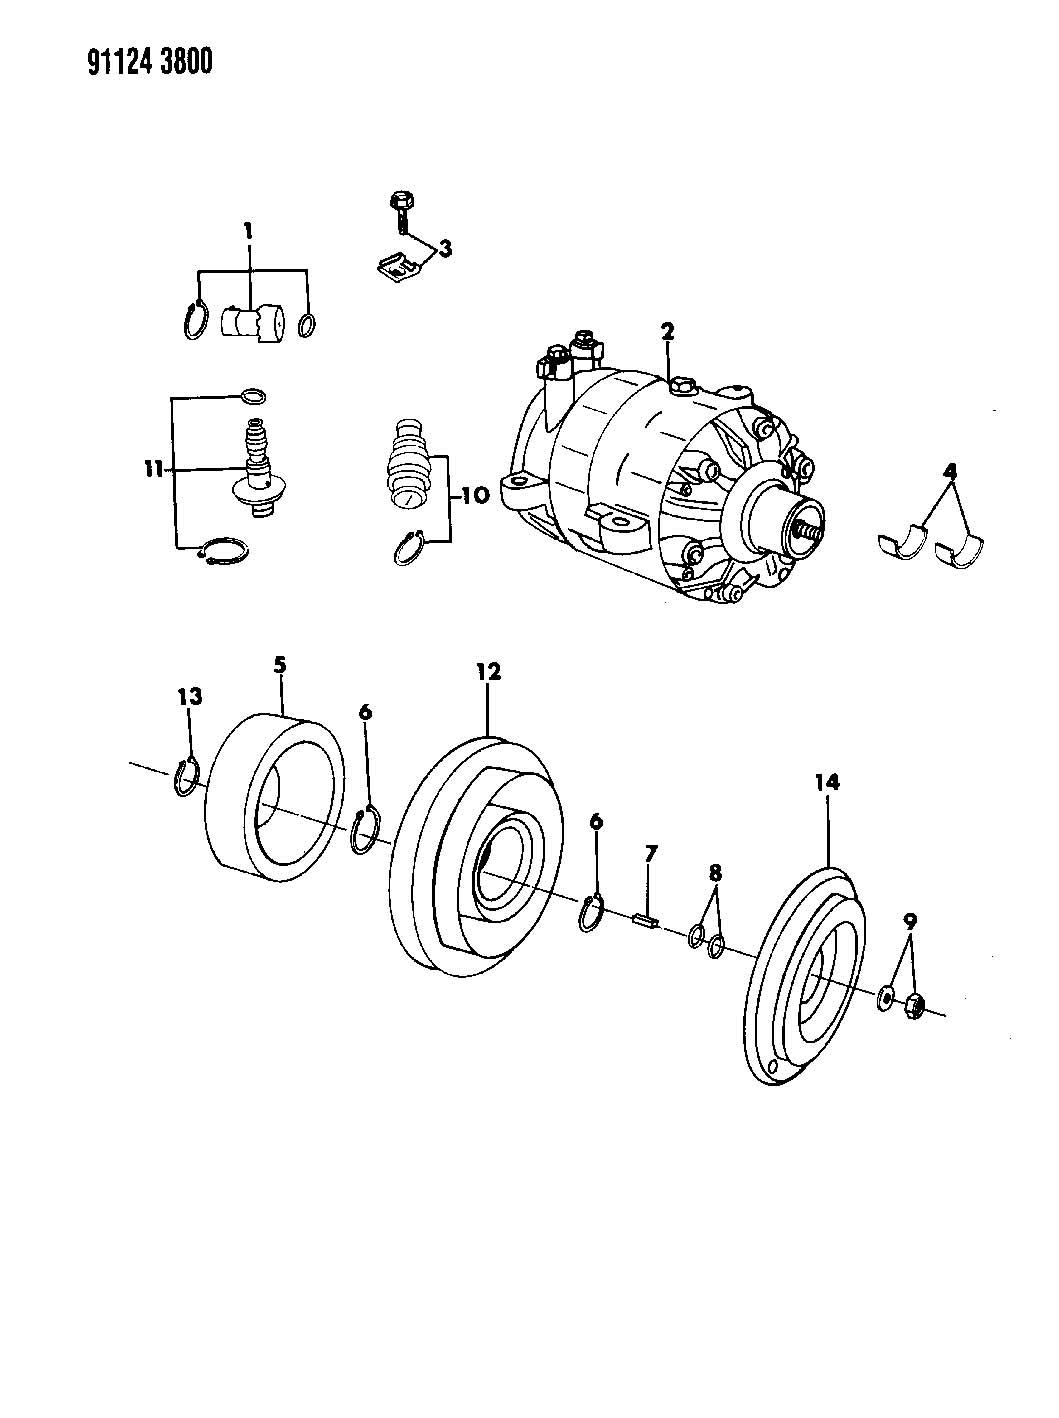 1991 plymouth acclaim fuse box diagram plymouth auto wiring diagram